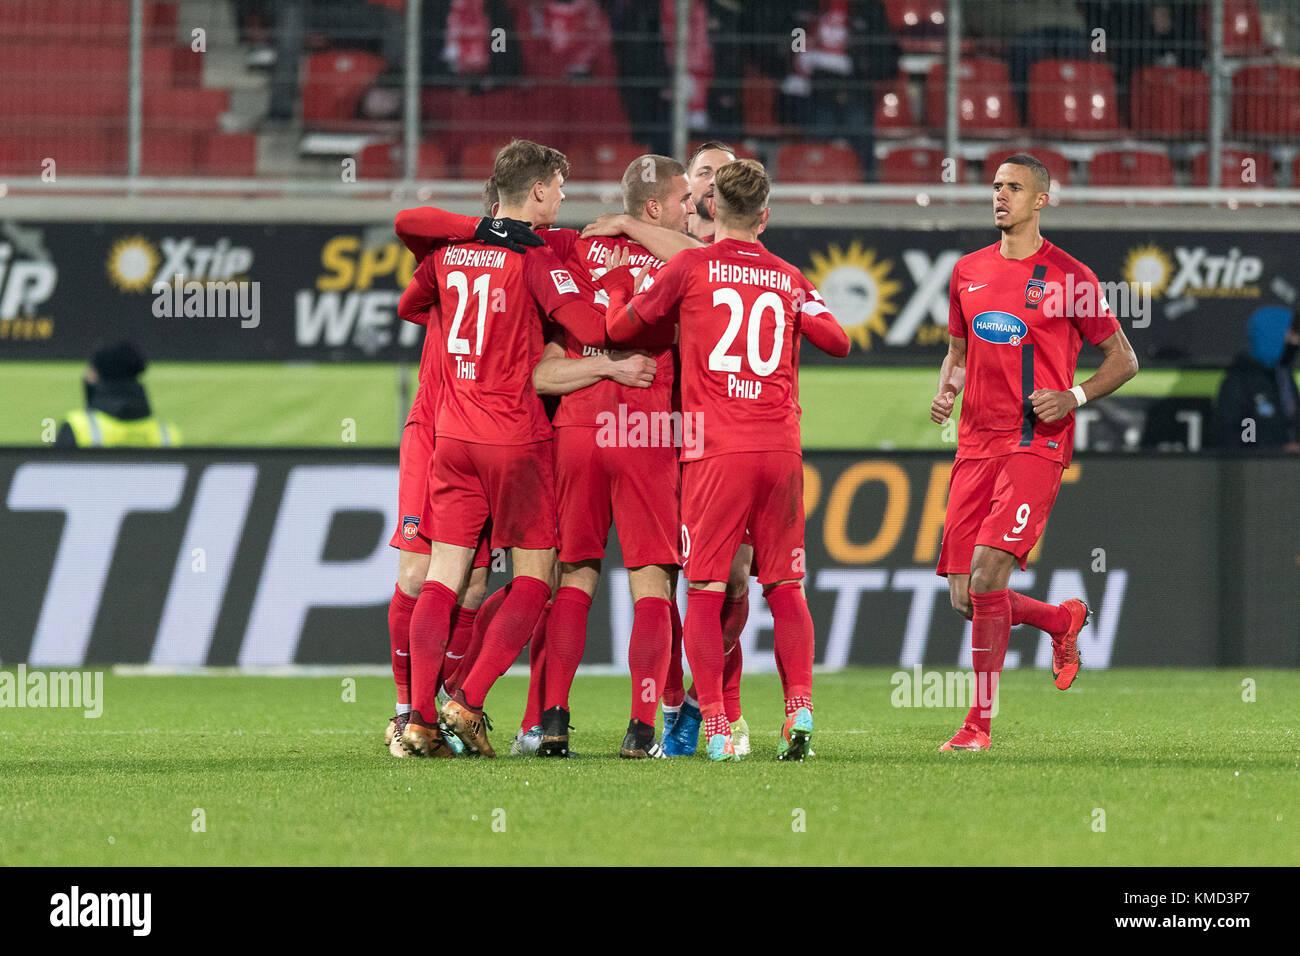 1:0 durch Mathias Wittek #05 (1. FC Heidenheim 1846),  1.FC Heidenheim 1846 vs 1.FC Kaiserslautern,  Herren, Fussball, Stock Photo